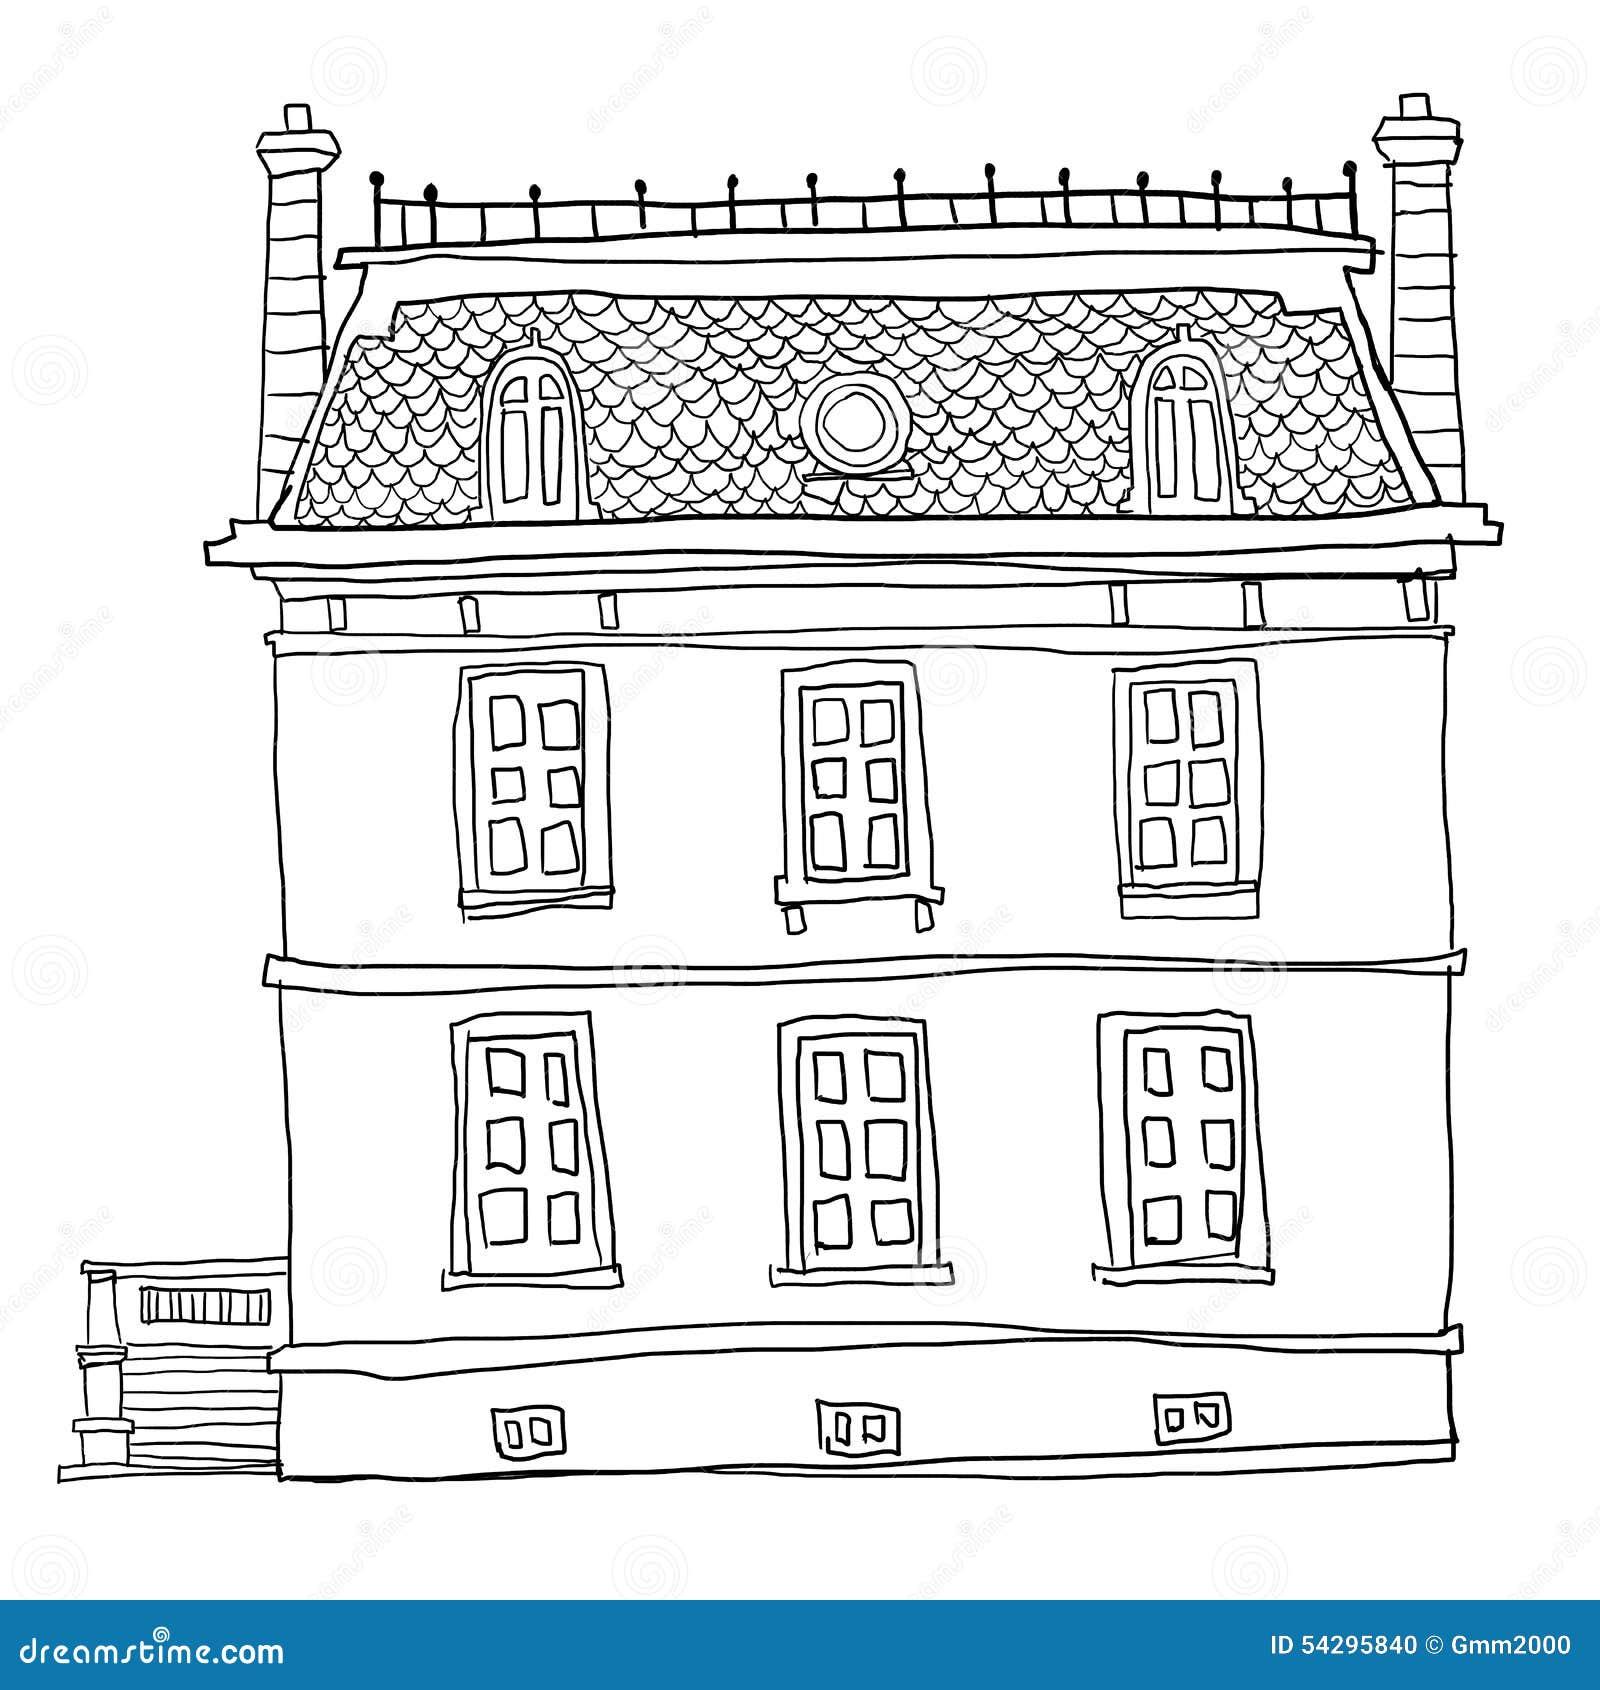 Line Art Of House : Vintage house line art stock illustration image